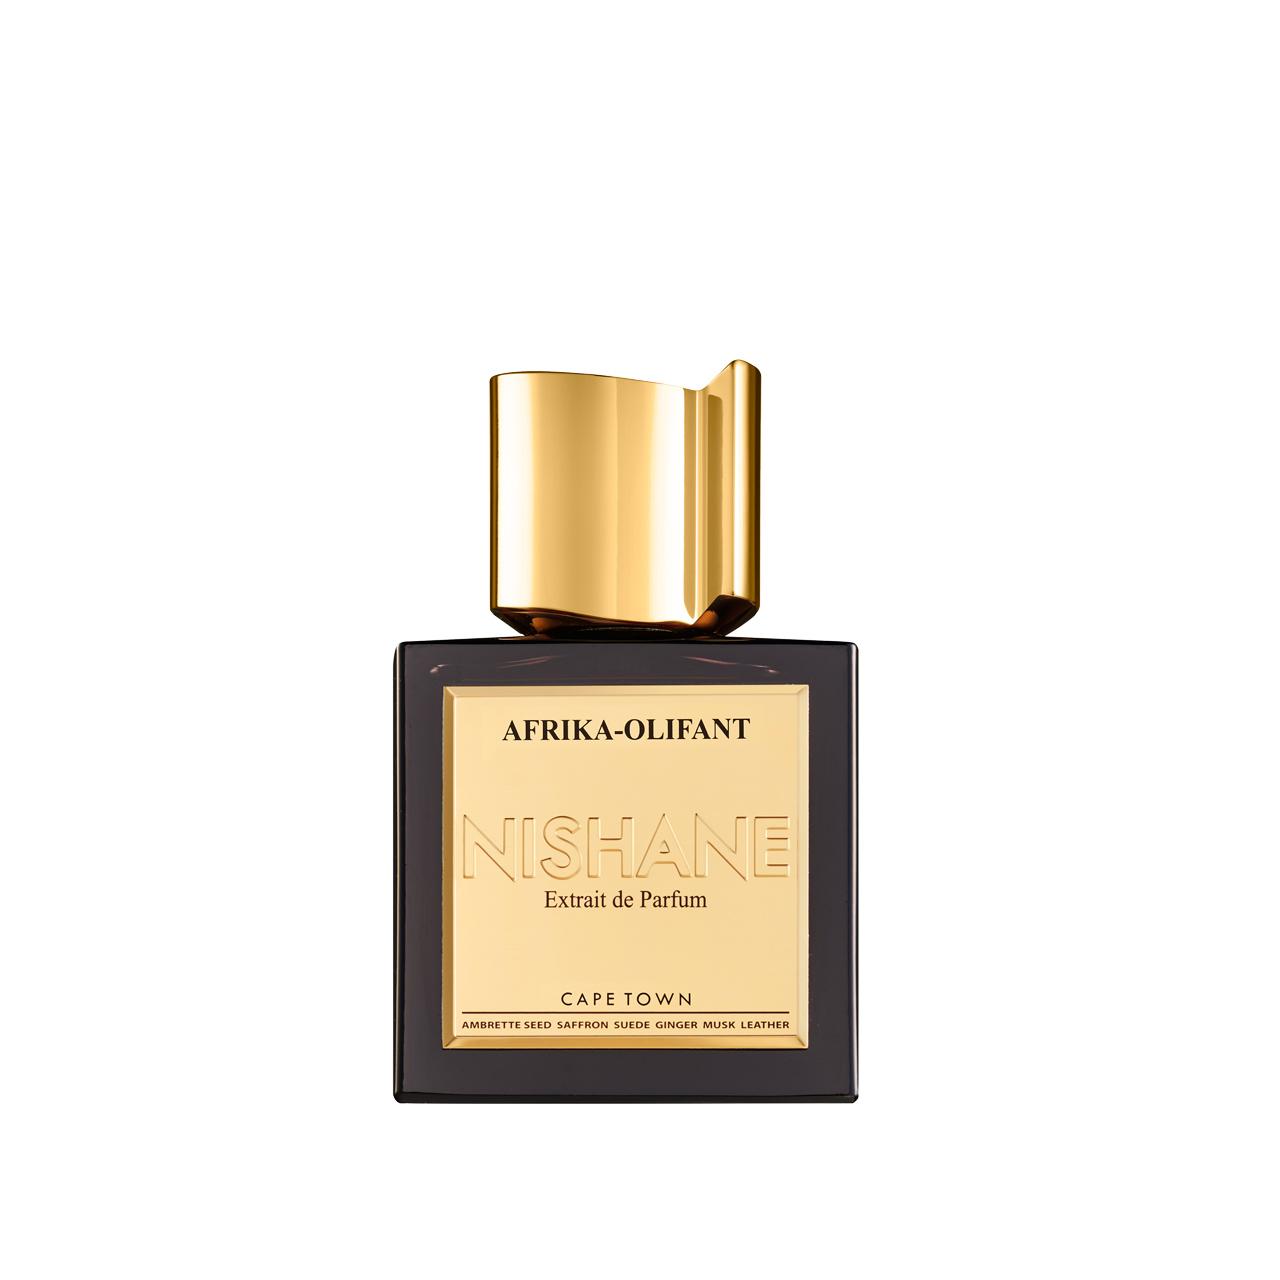 Afrika-Olifant - Extrait de Parfum